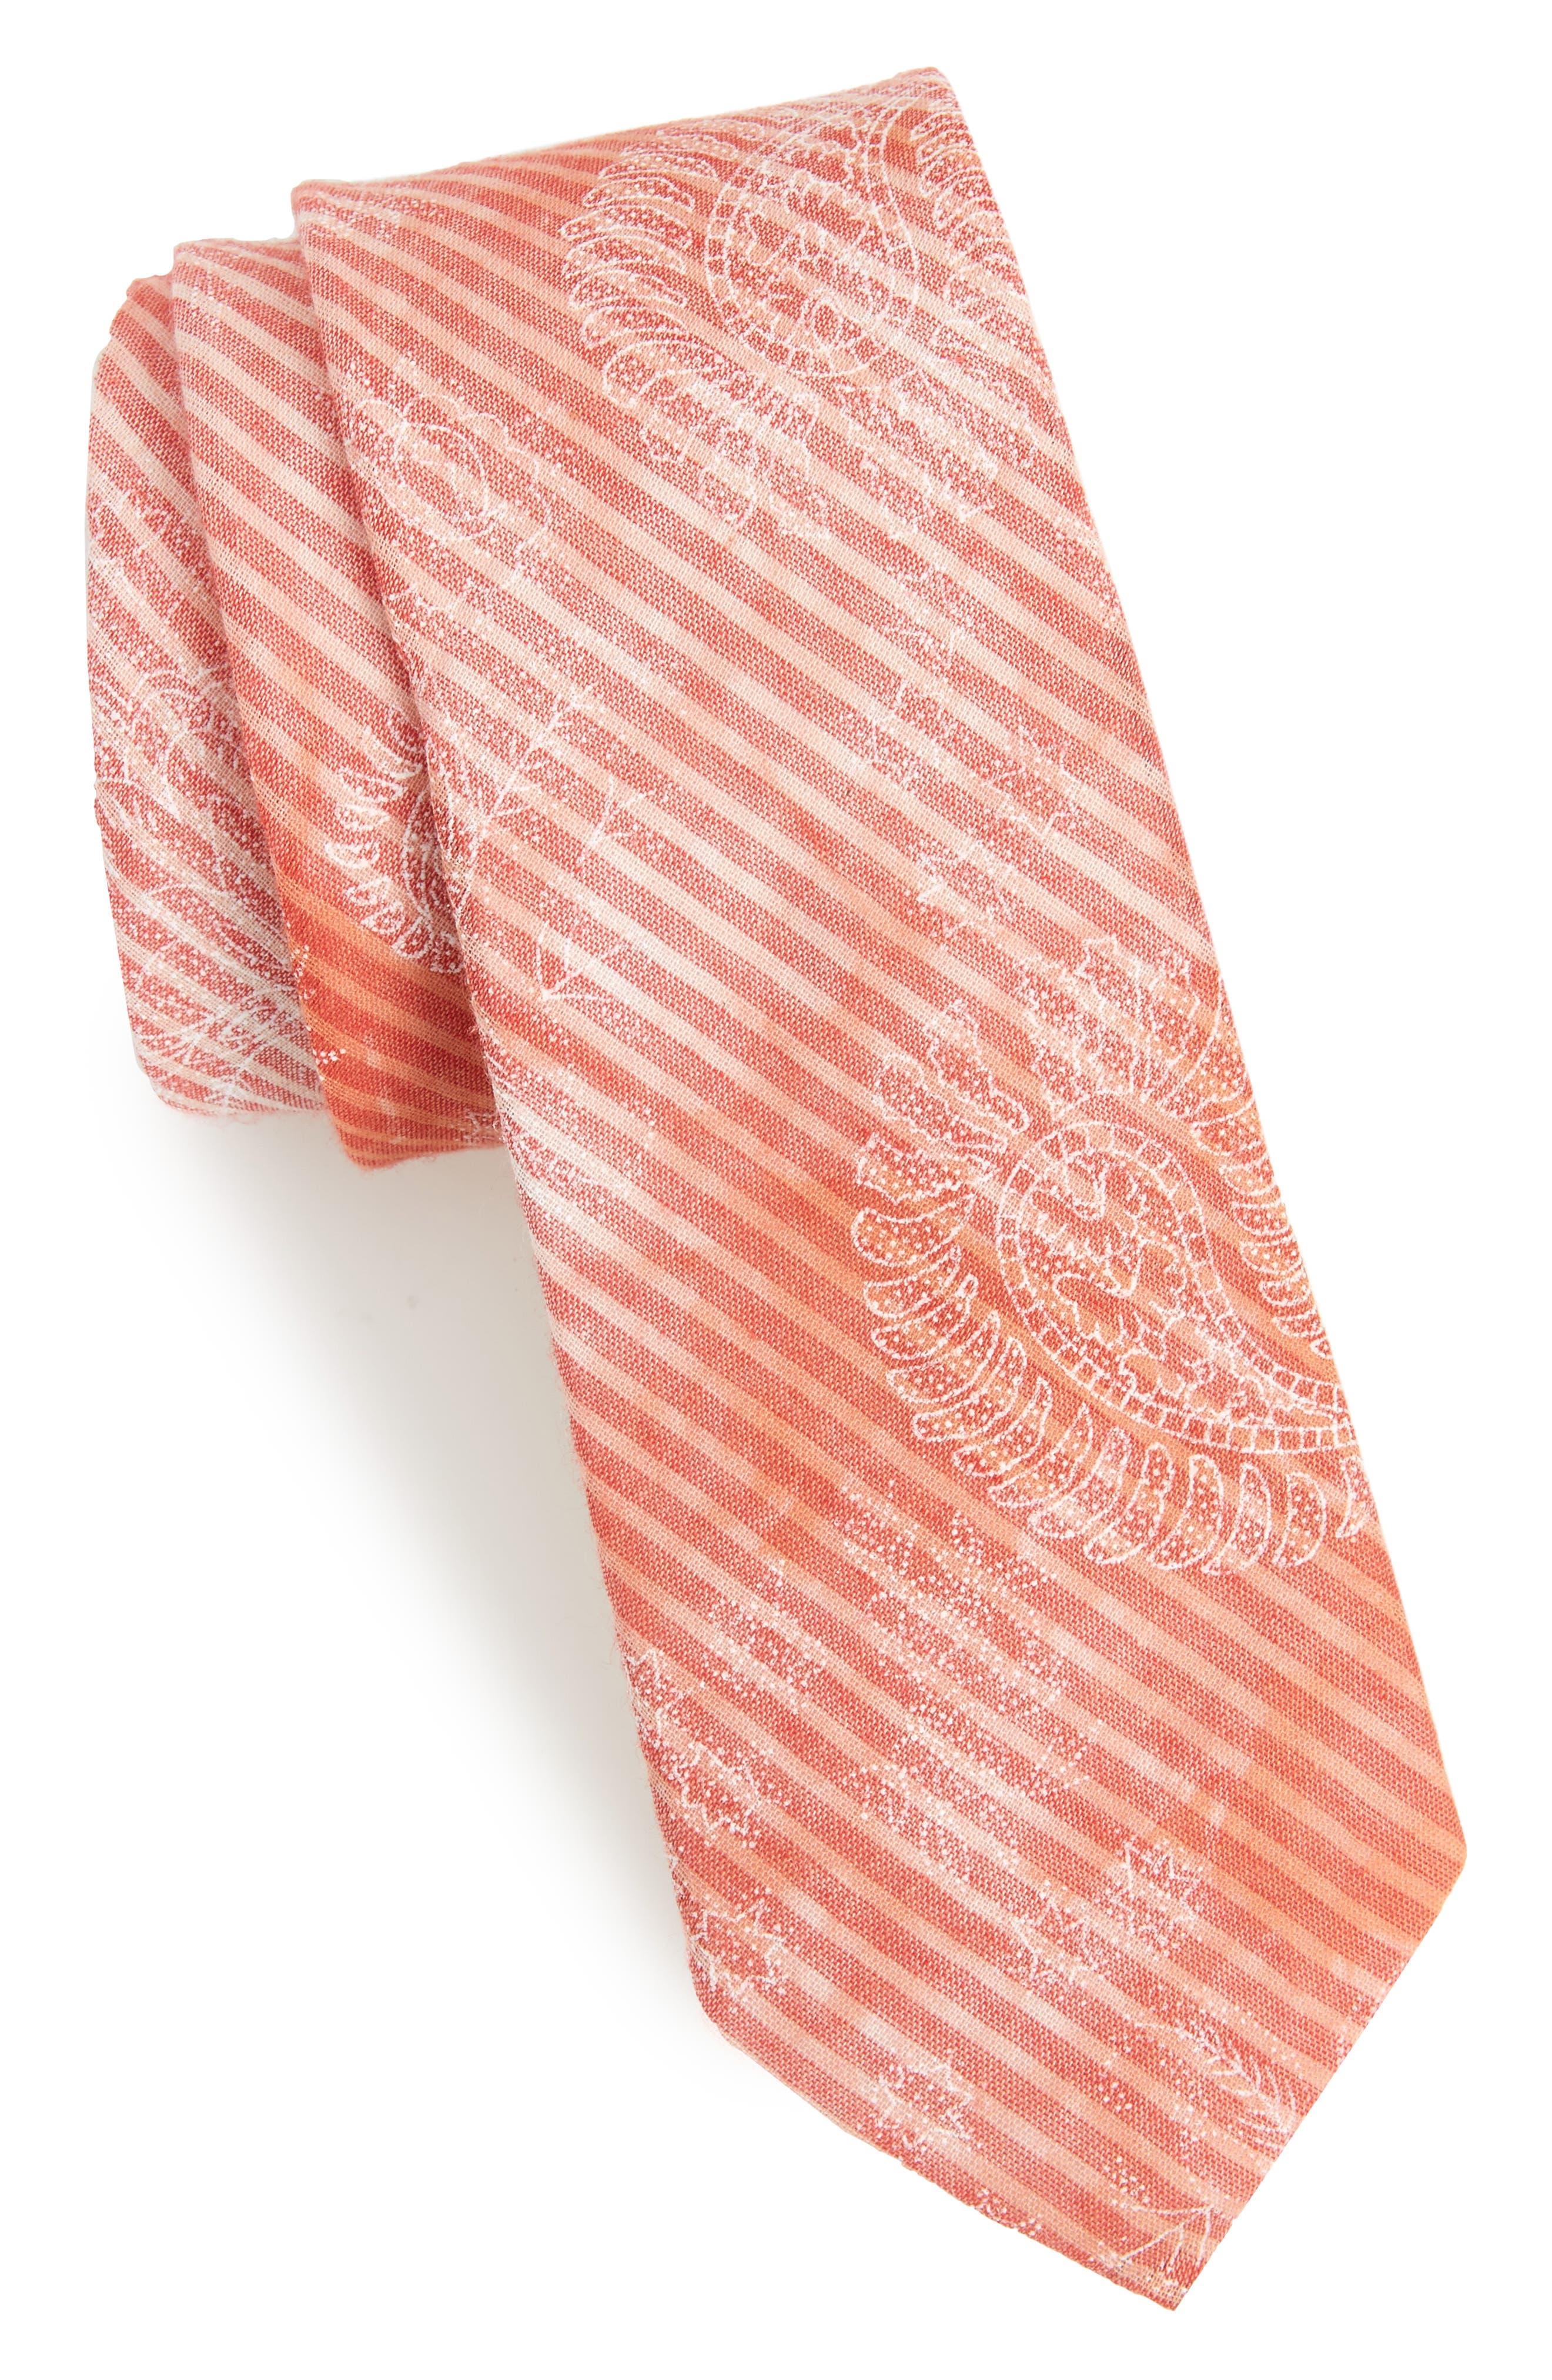 1901 Lee Paisley Cotton Tie